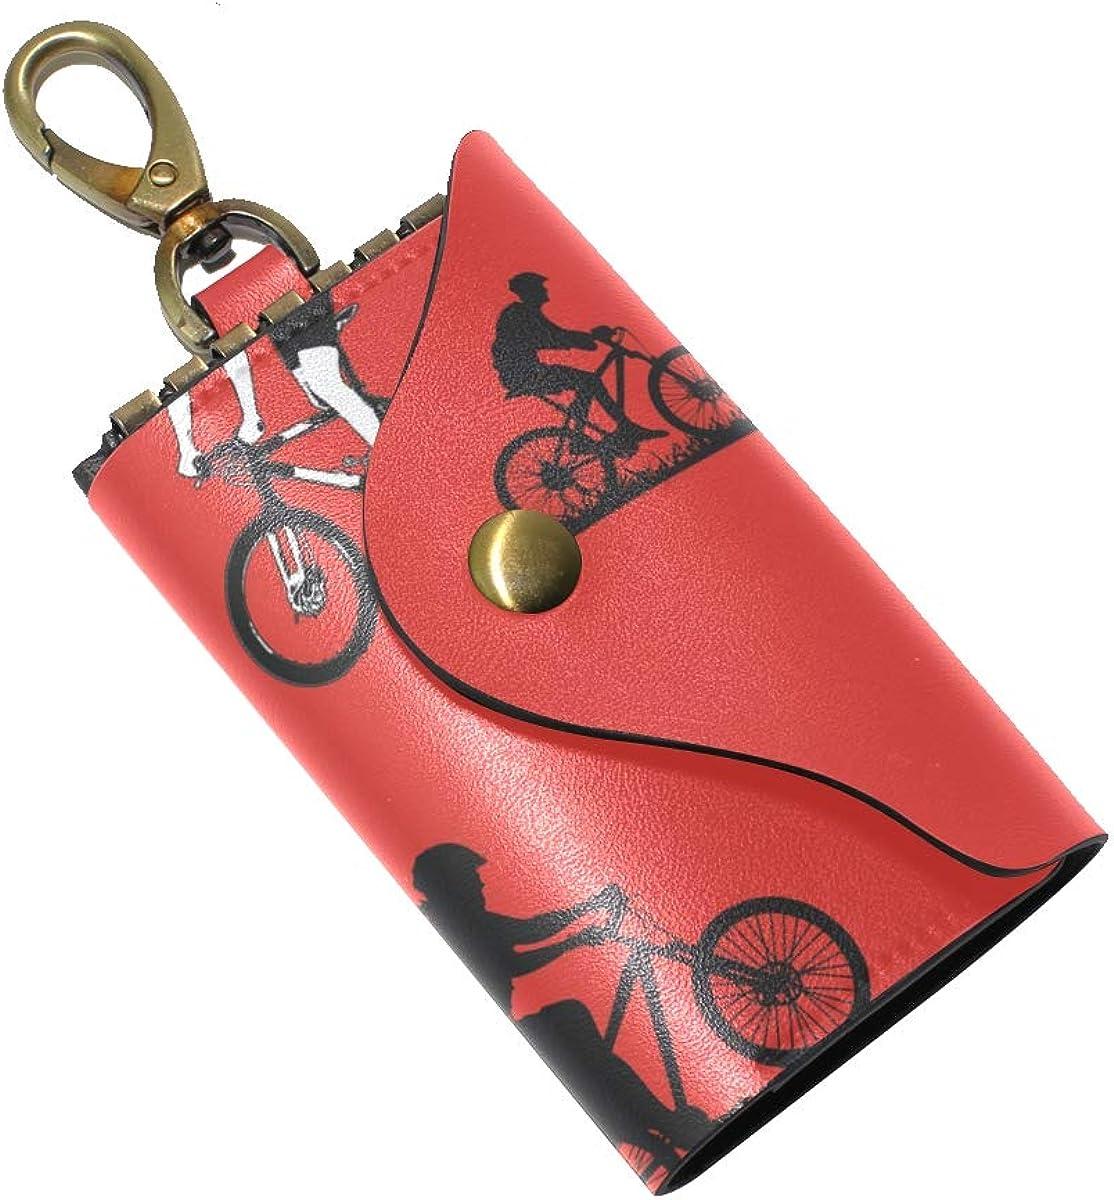 KEAKIA Riding A Bike Leather Key Case Wallets Tri-fold Key Holder Keychains with 6 Hooks 2 Slot Snap Closure for Men Women